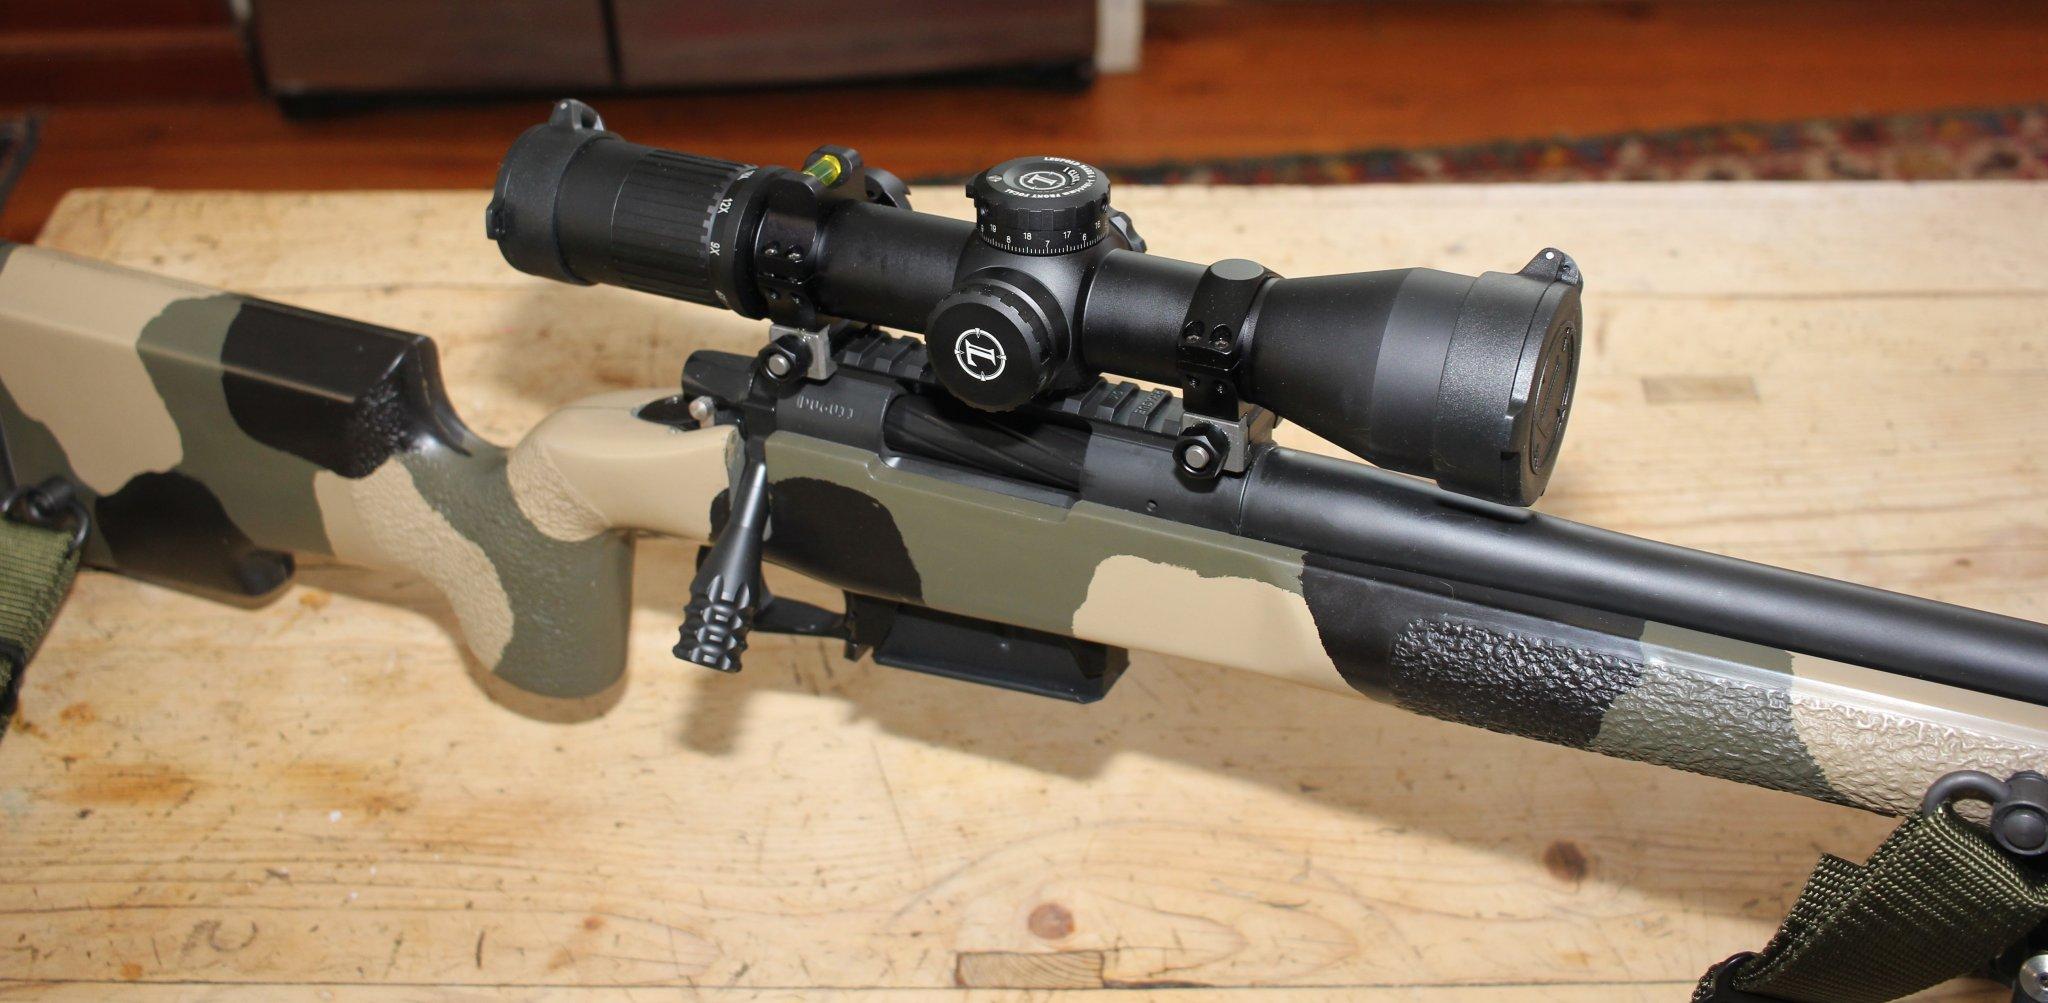 On Rifle IMG_0808.jpg